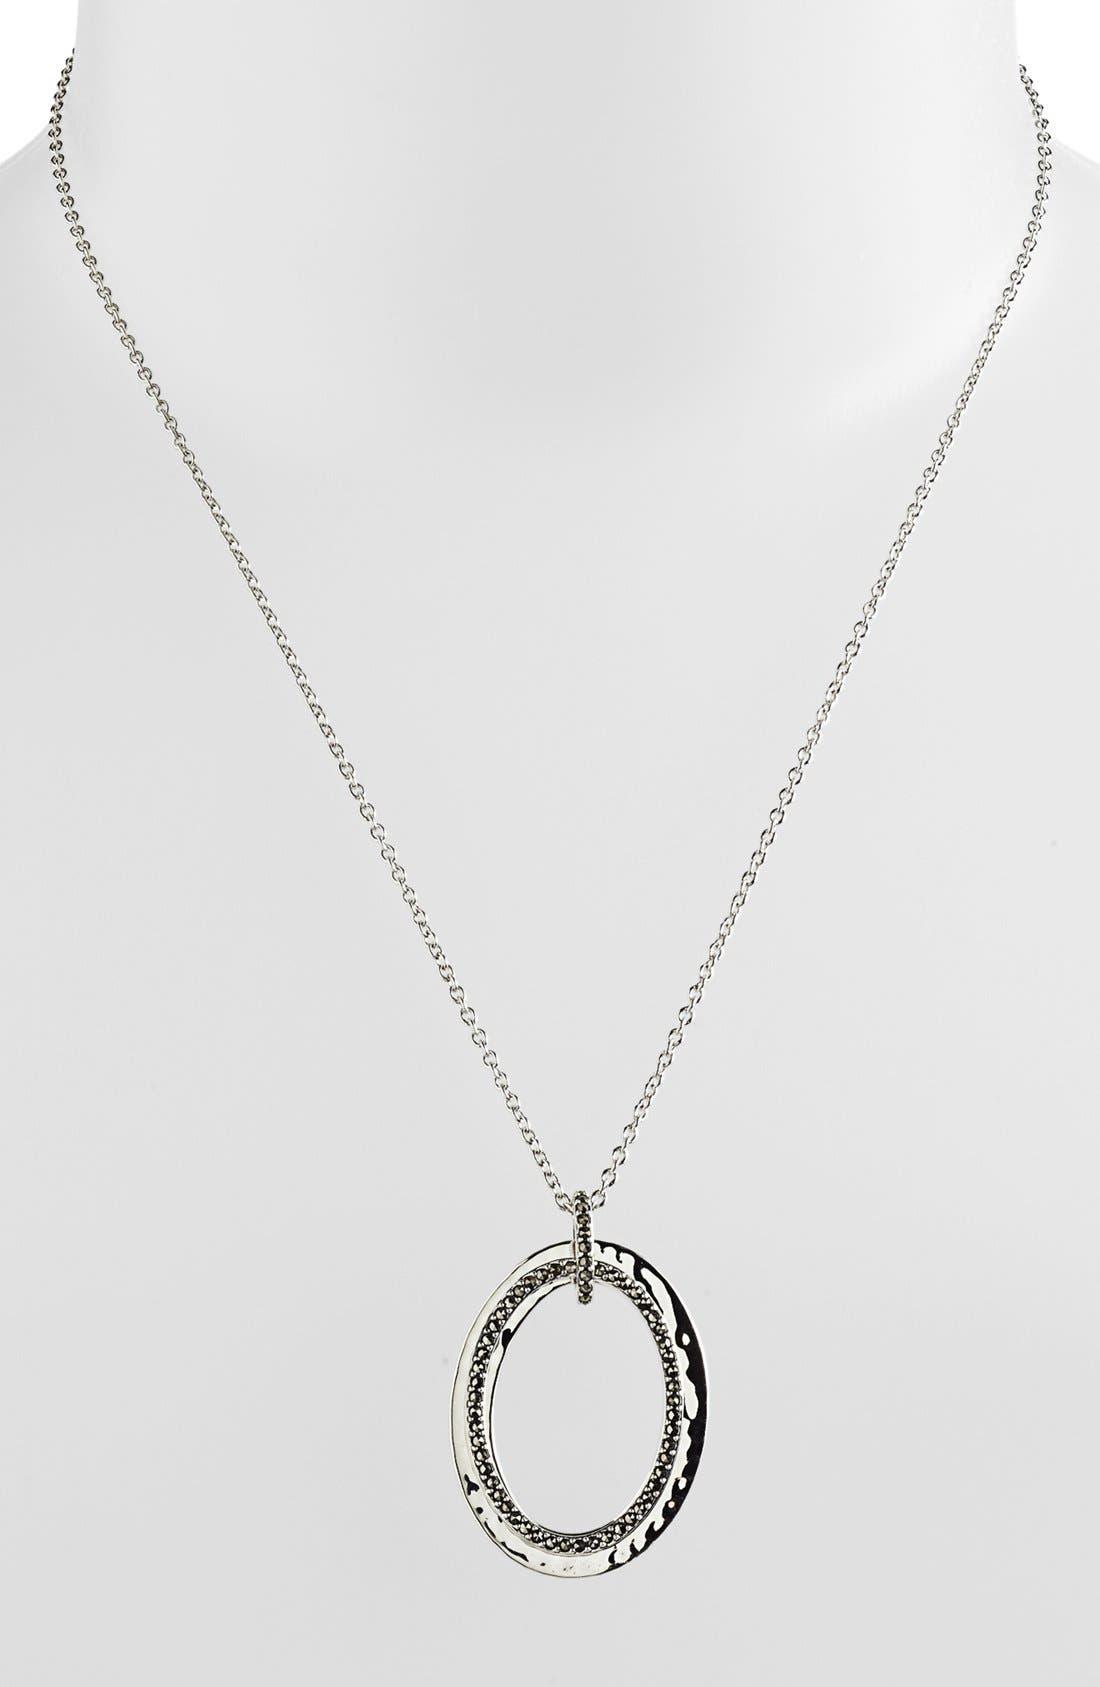 Alternate Image 1 Selected - Judith Jack 'Halo' Pendant Necklace